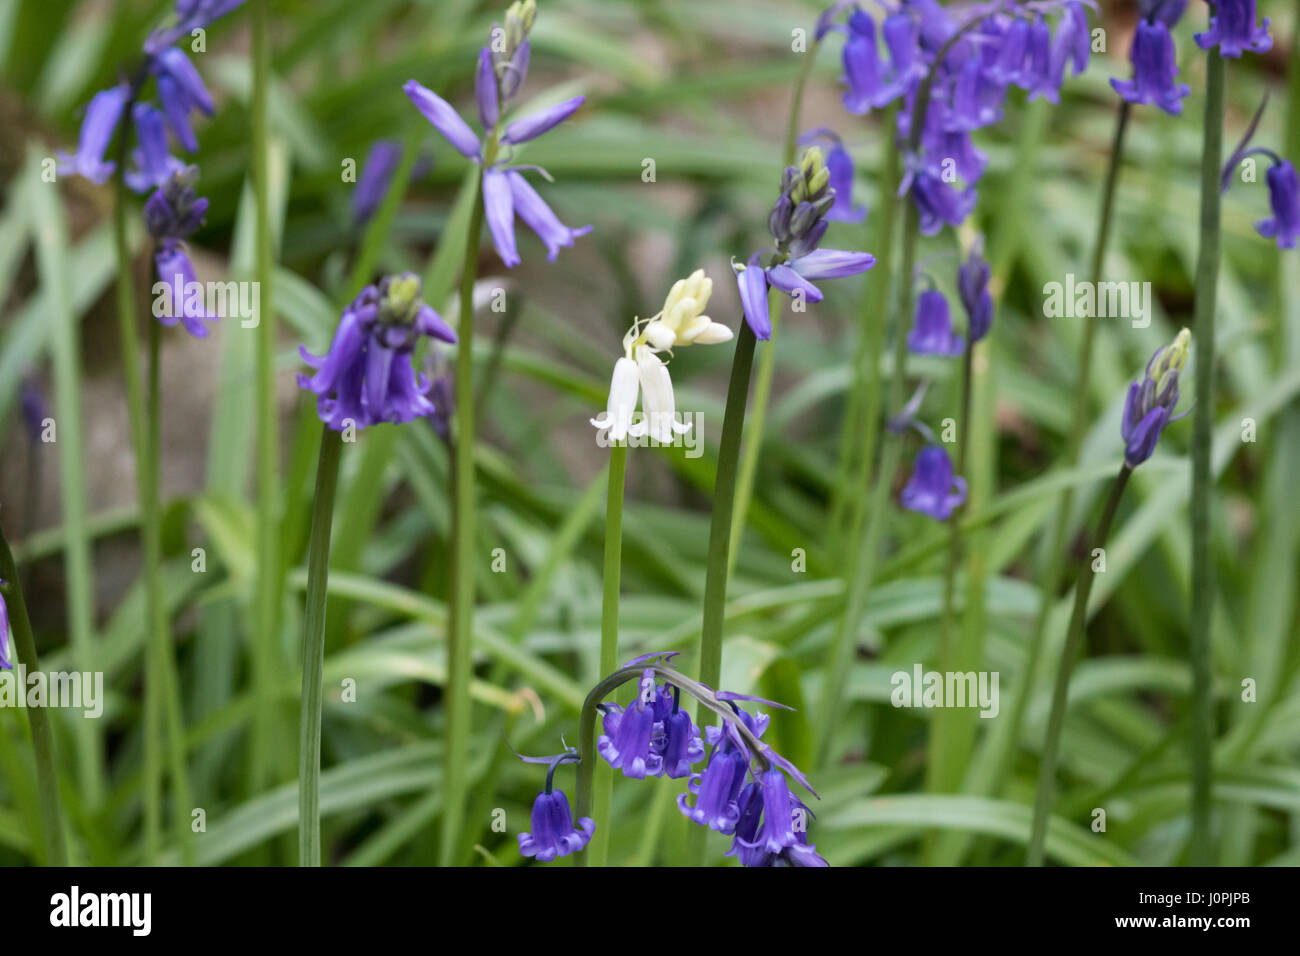 White Bluebell Flower Surrounded By Blue Bluebell Flowers Stock